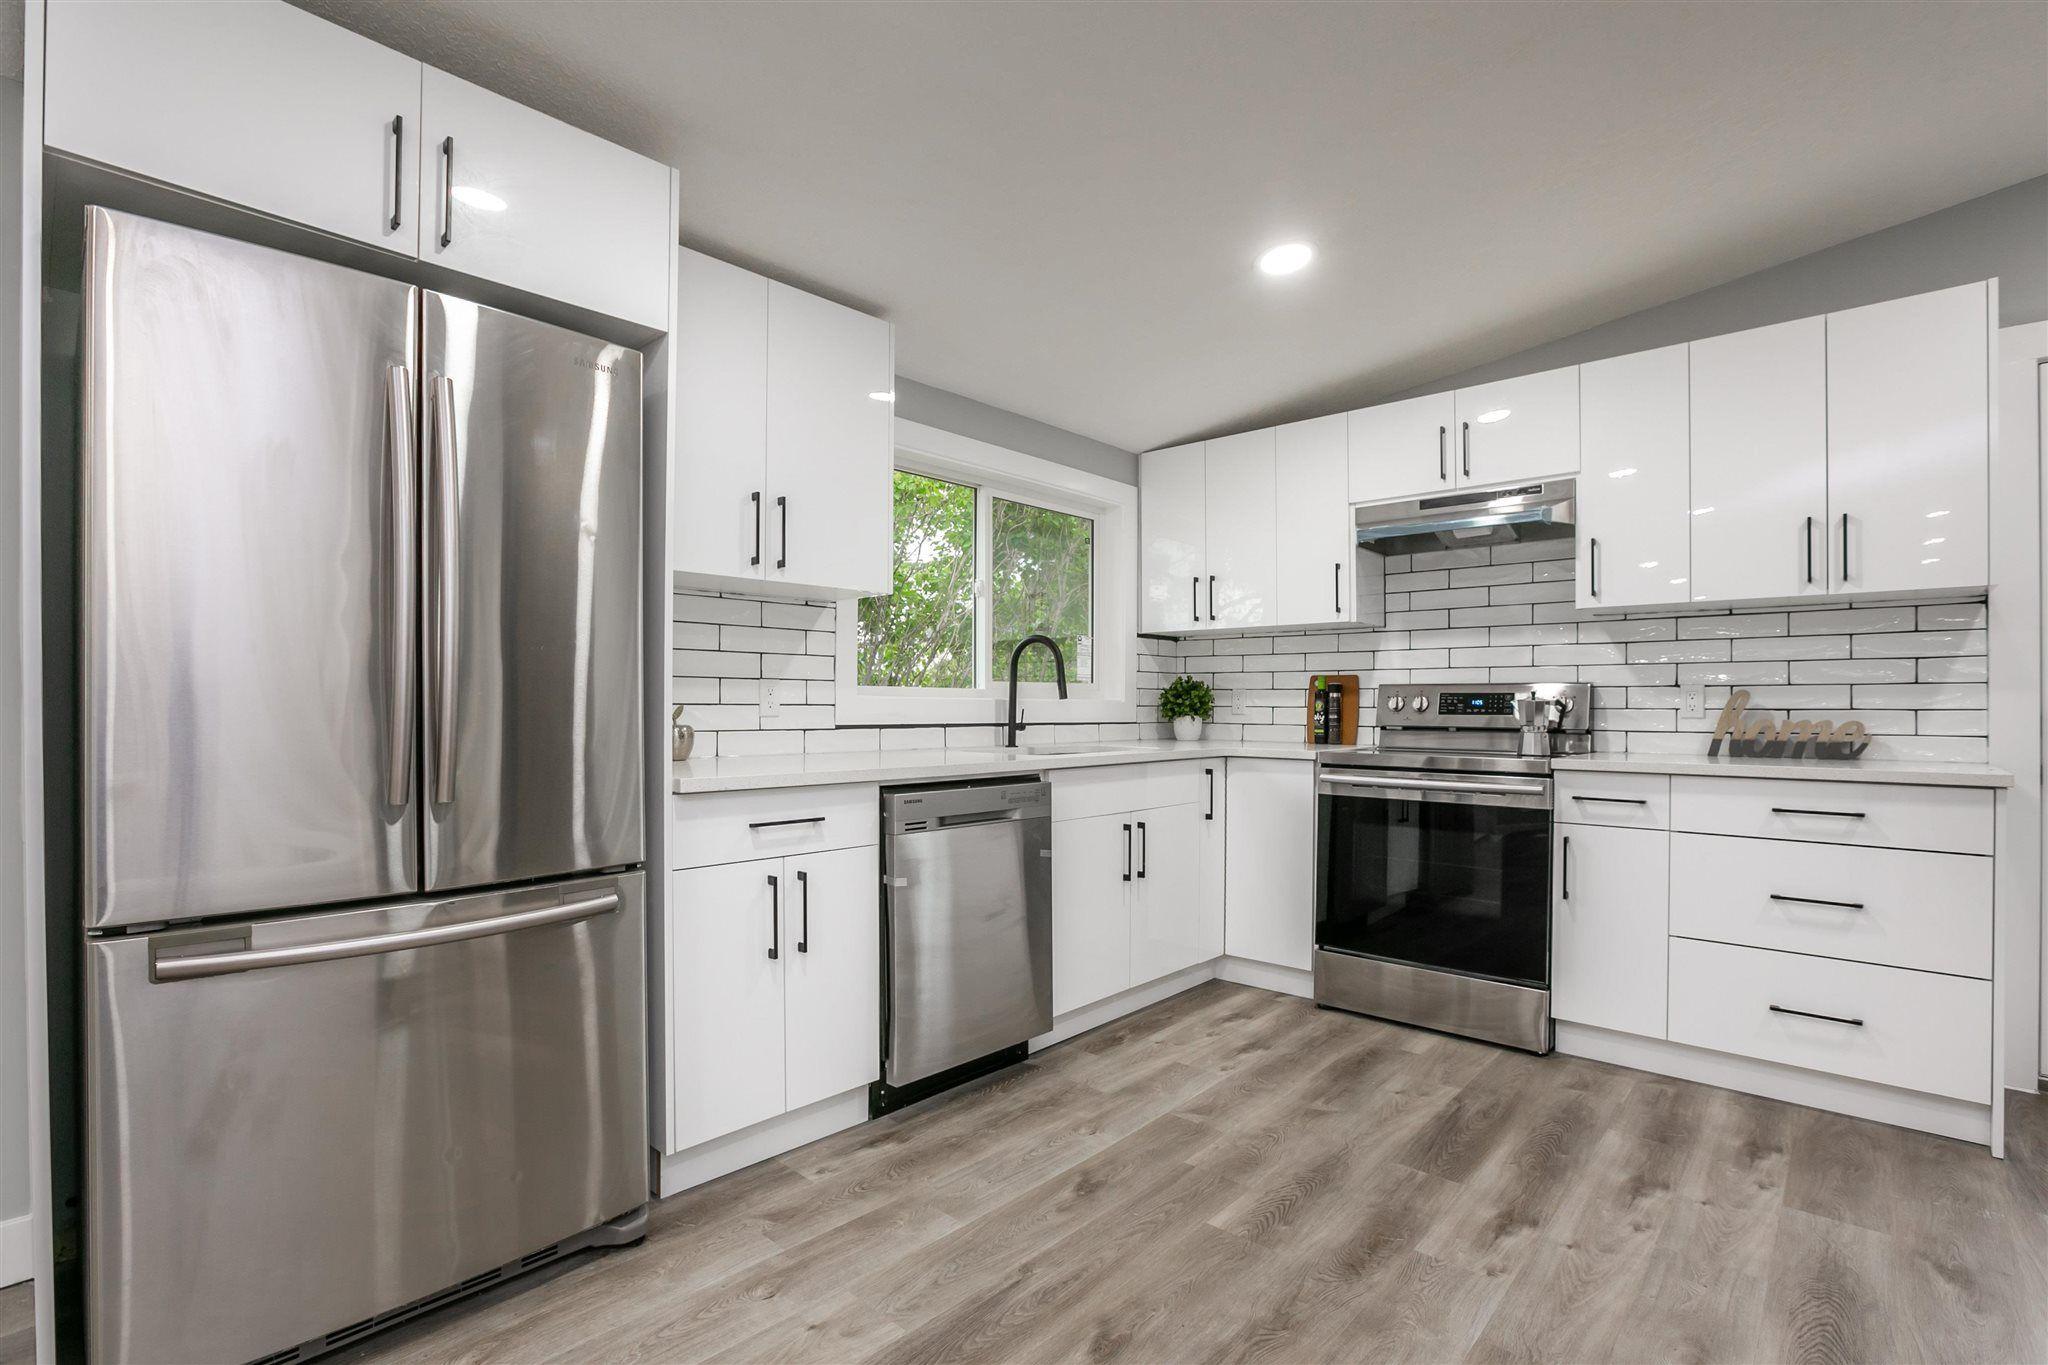 Main Photo: 9151 150 Street in Edmonton: Zone 22 House for sale : MLS®# E4250068